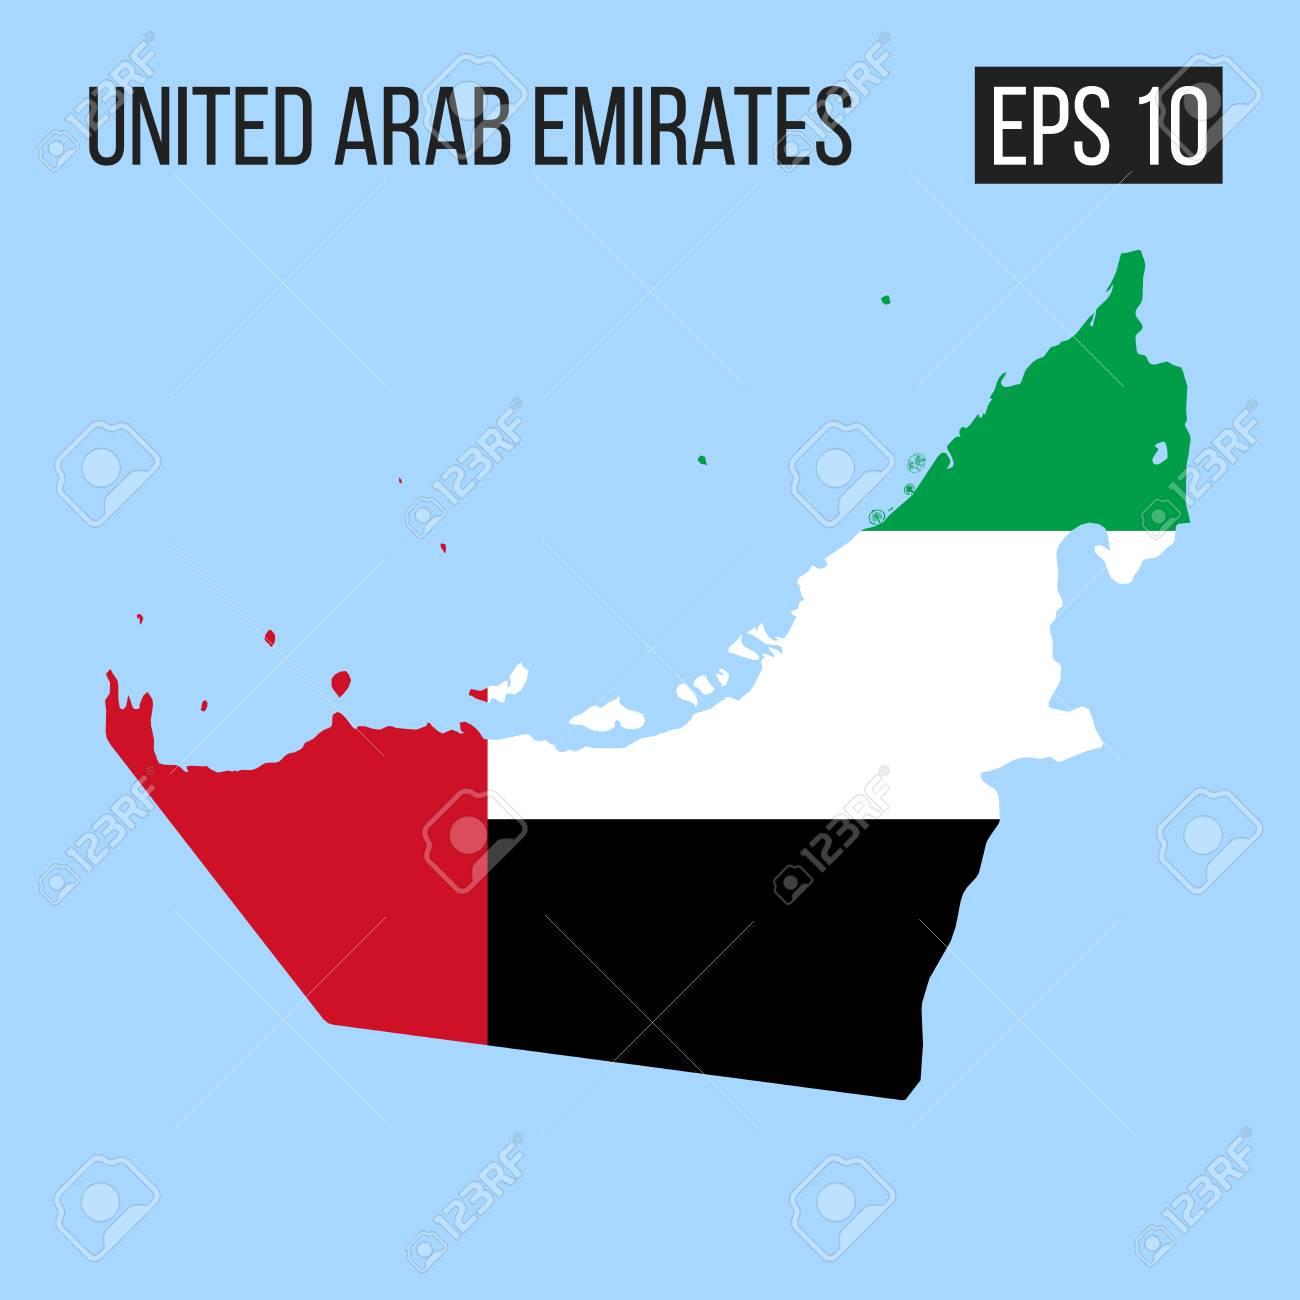 United Arab Emirates map border with flag on morocco map, sudan map, qatar map, emirates map, syria map, iraq map, yemen map, turkey map, israel map, maldives map, western sahara map, east timor map, philippines map, kabul map, cyprus map, united college map, sri lanka map, baghdad map, bahrain map, lebanon map,